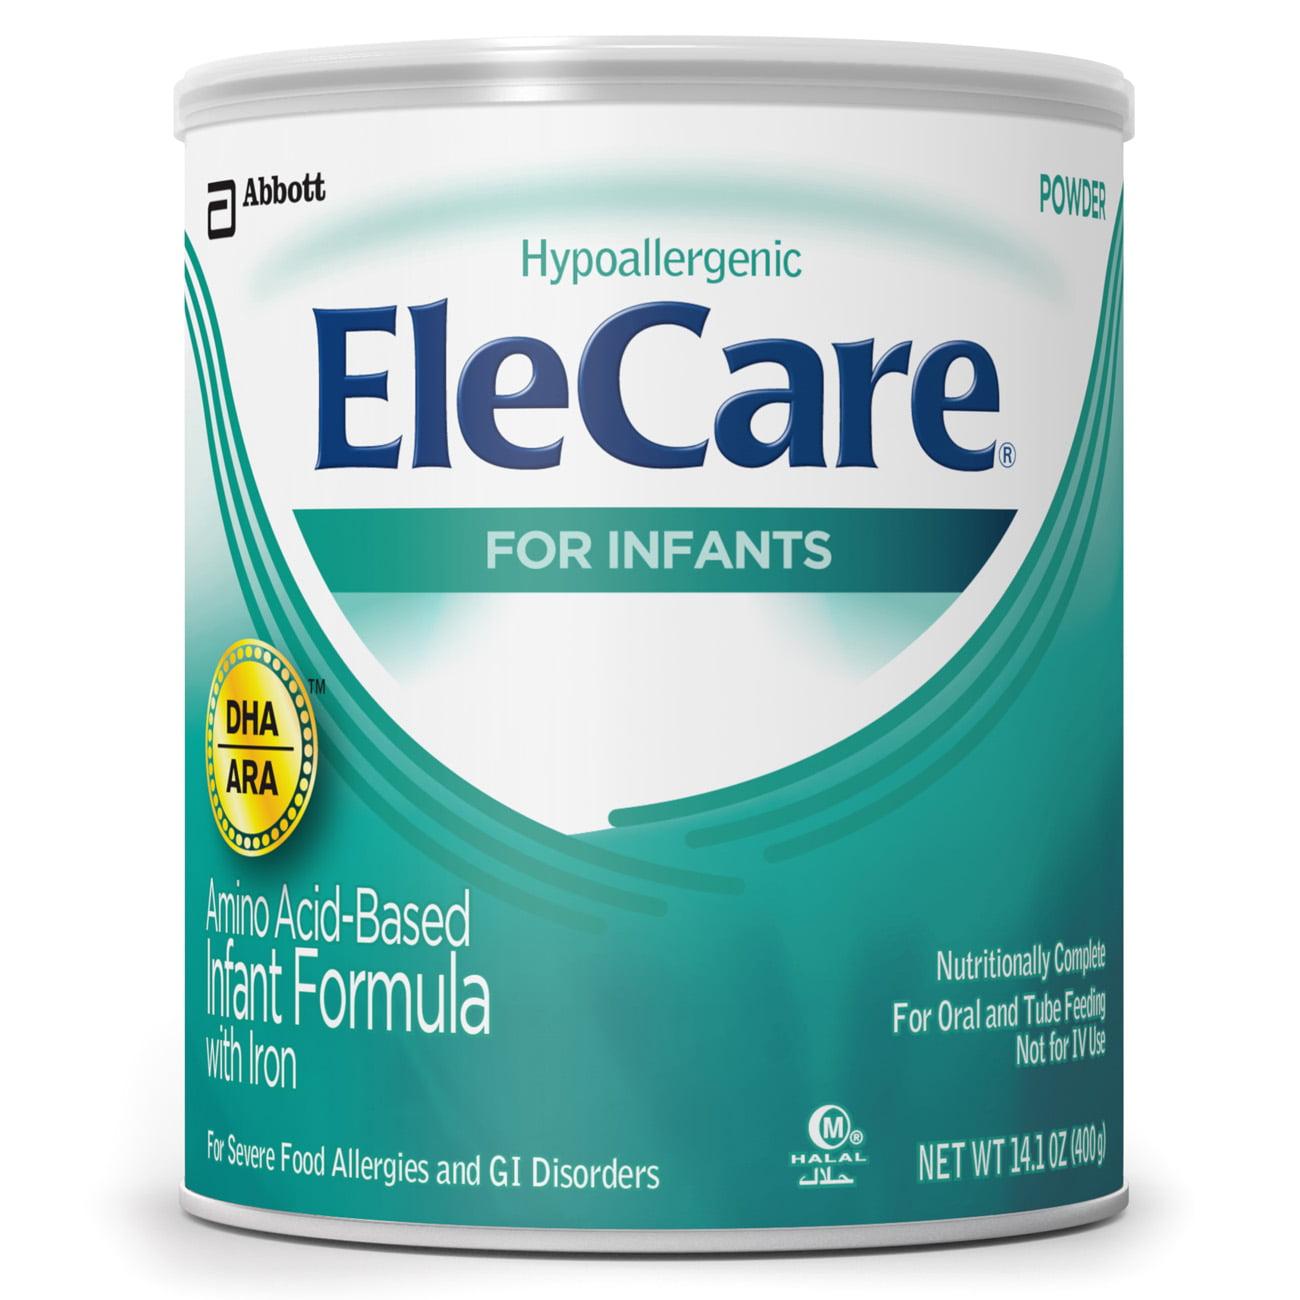 Elecare Medical Food, 14.1-Ounce